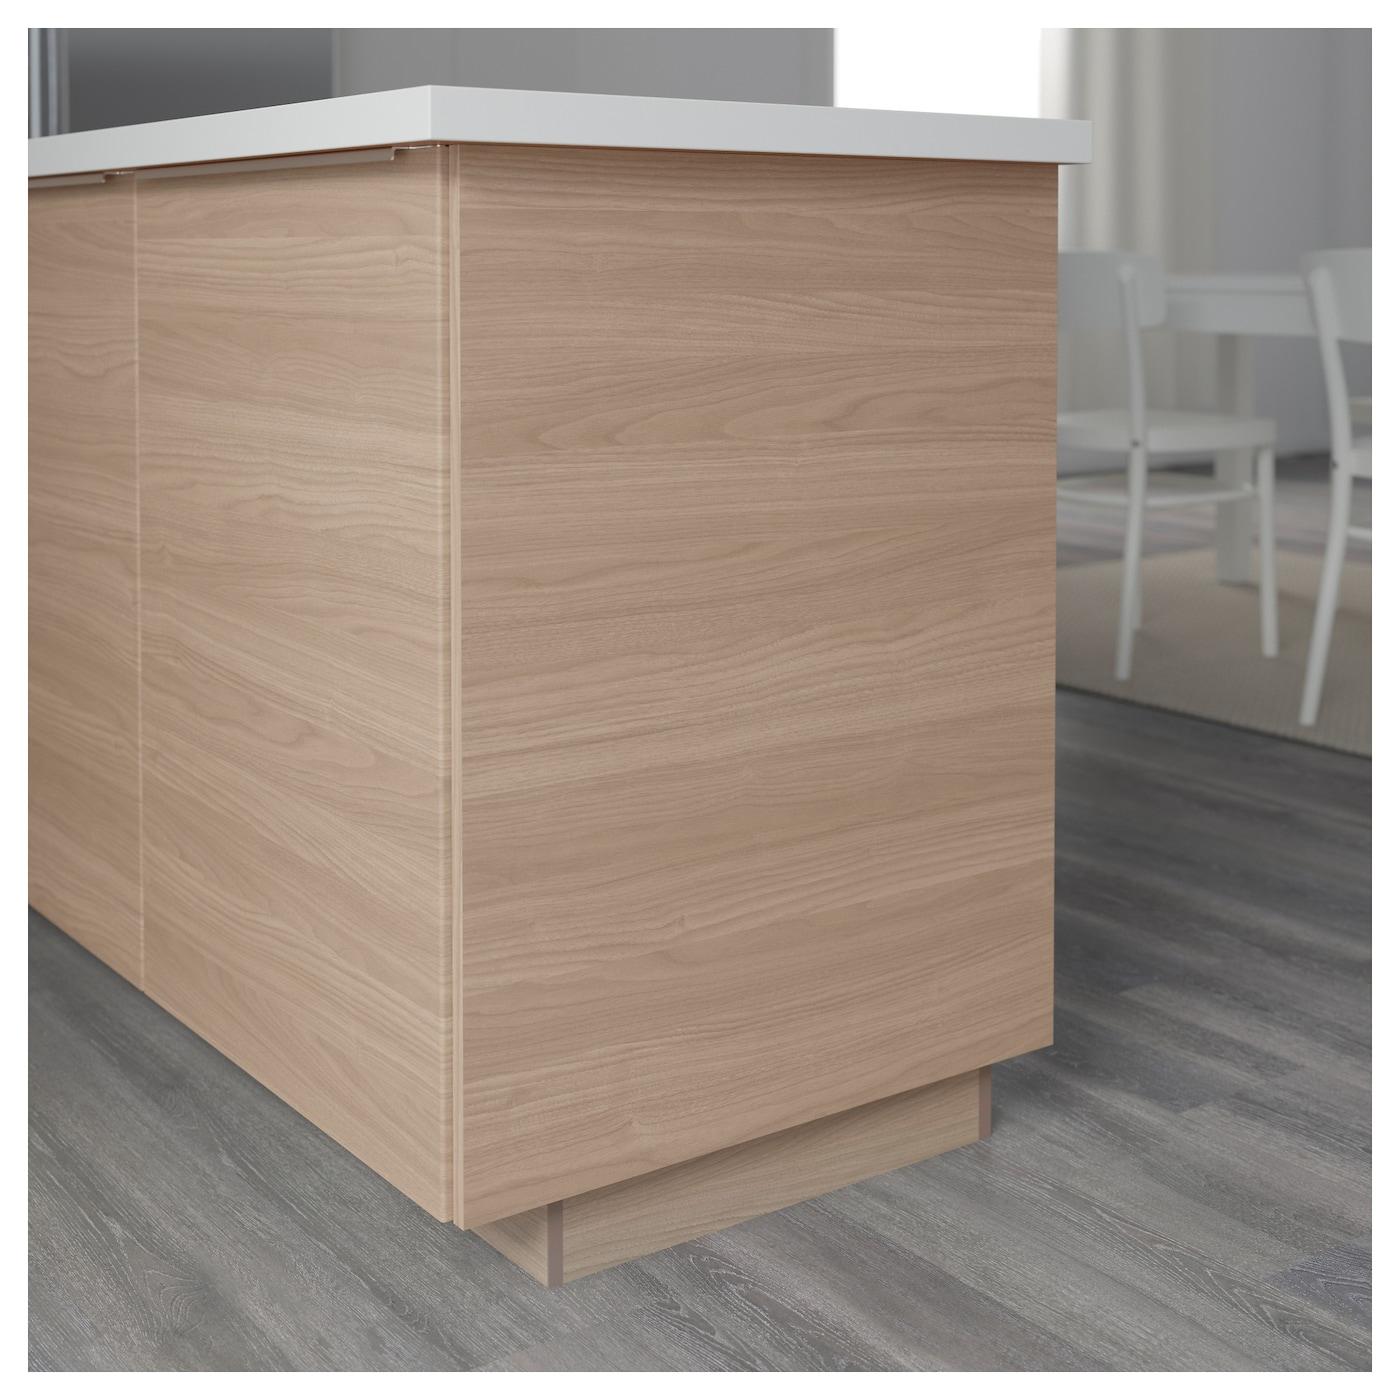 brokhult cover panel walnut effect light grey 39x106 cm ikea. Black Bedroom Furniture Sets. Home Design Ideas